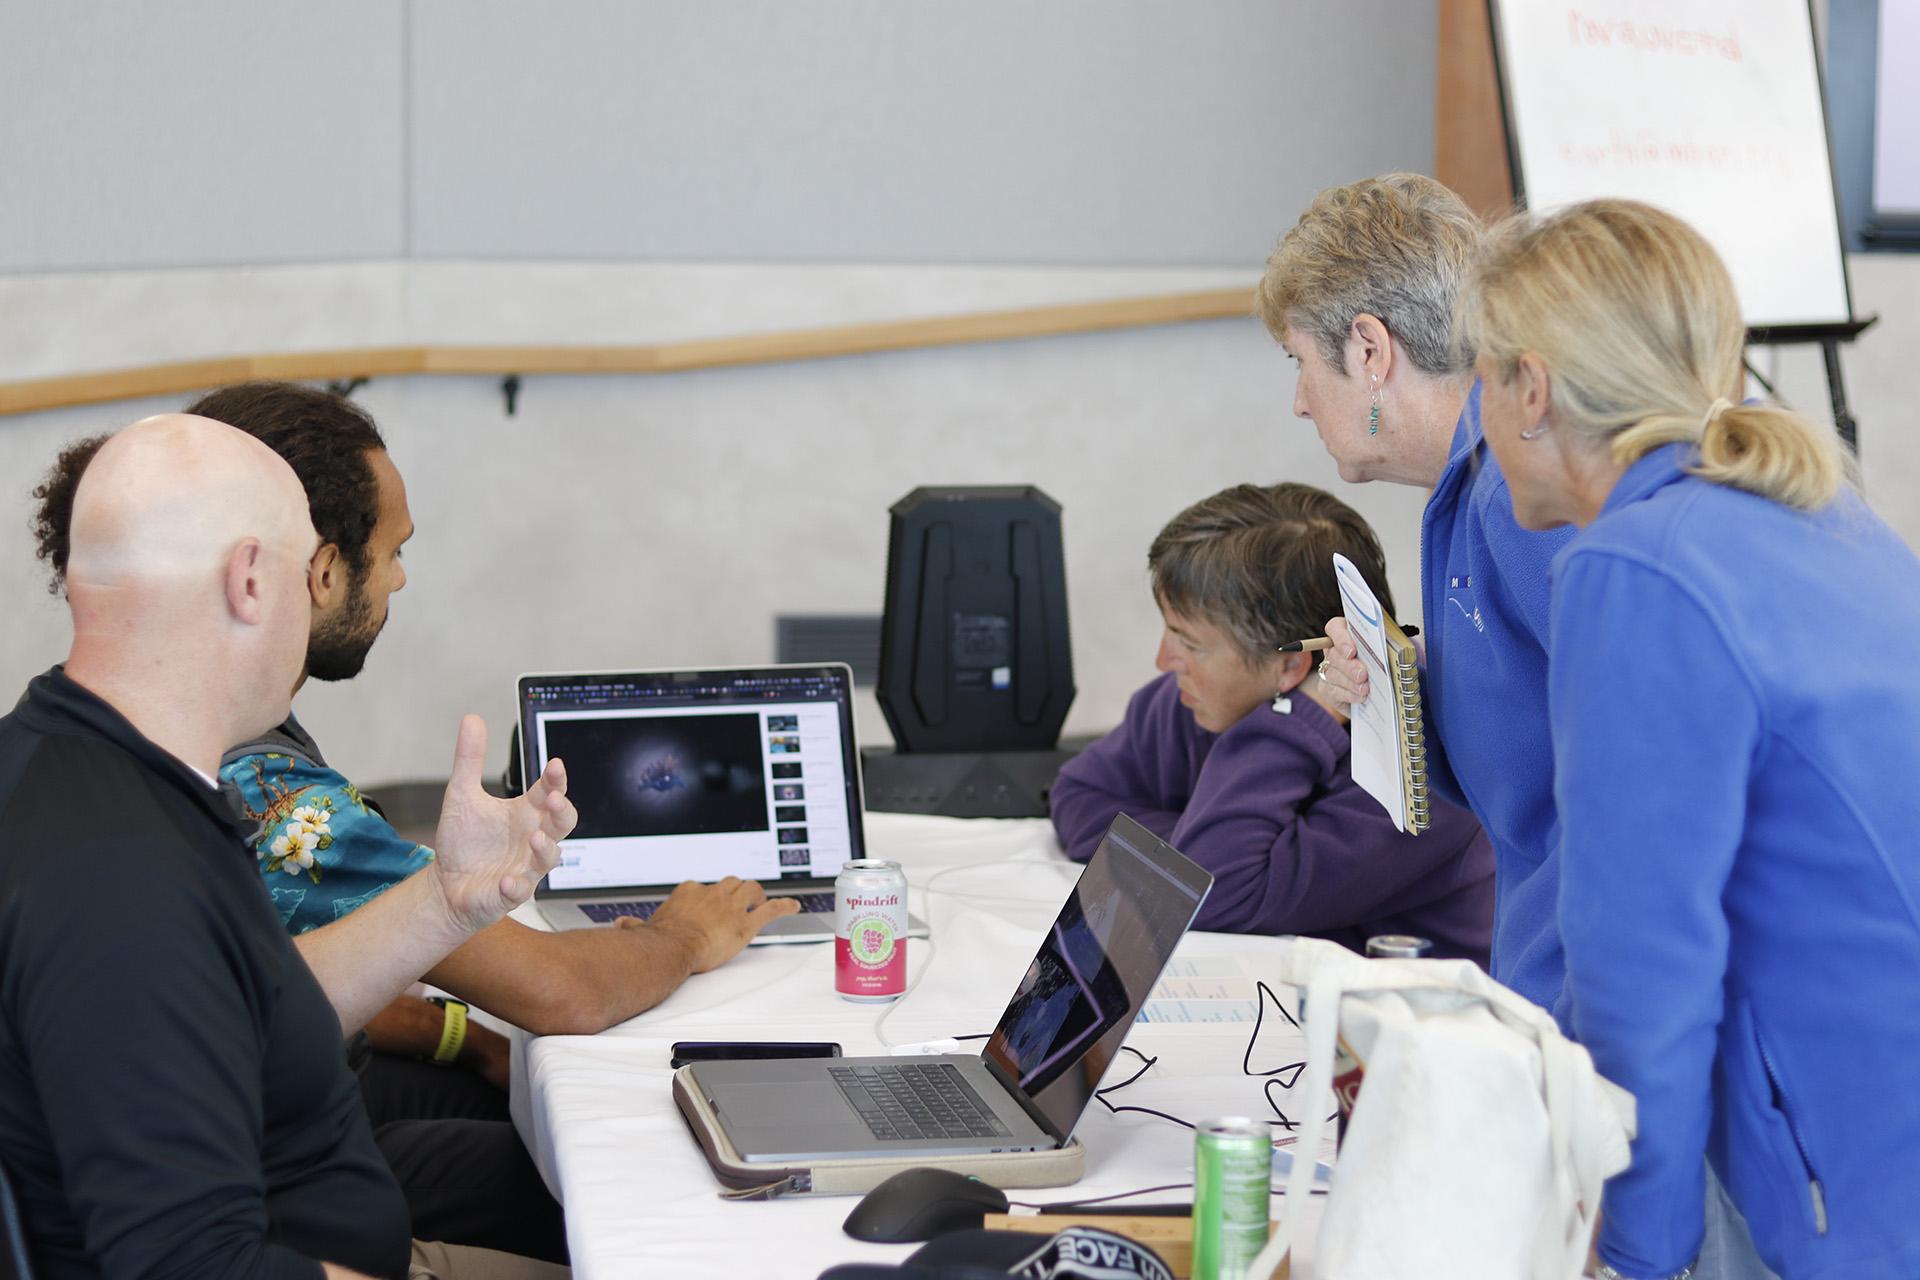 Adam Merry and Craig Mink explore 3D visualization tools with workshop participants